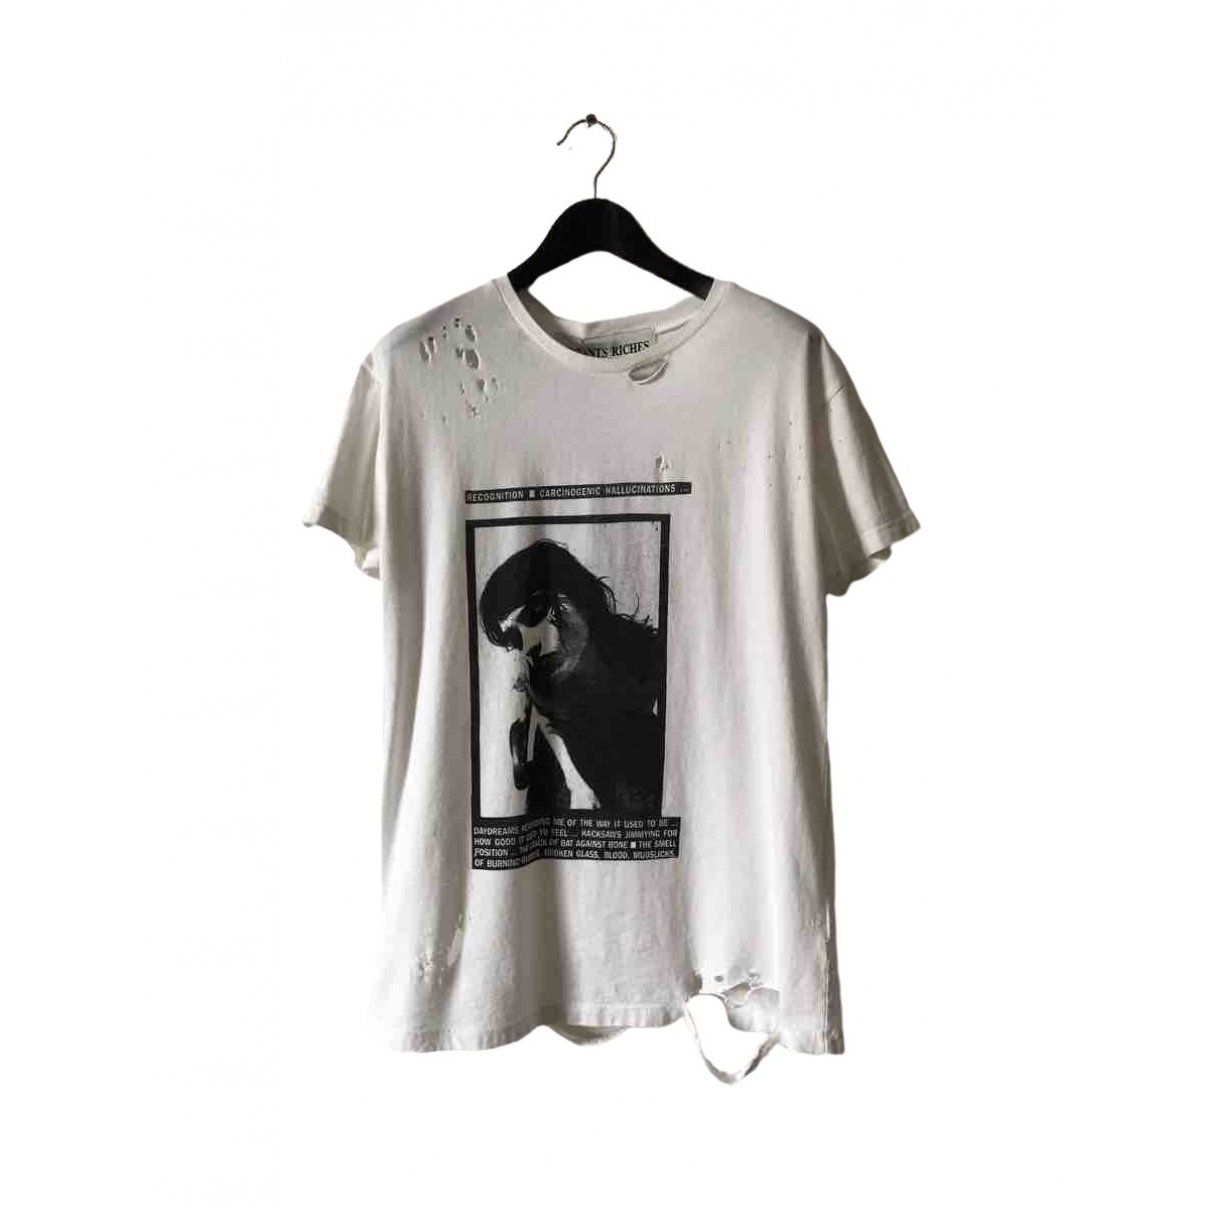 Enfants Riches Deprimes \N T-Shirts in  Weiss Baumwolle